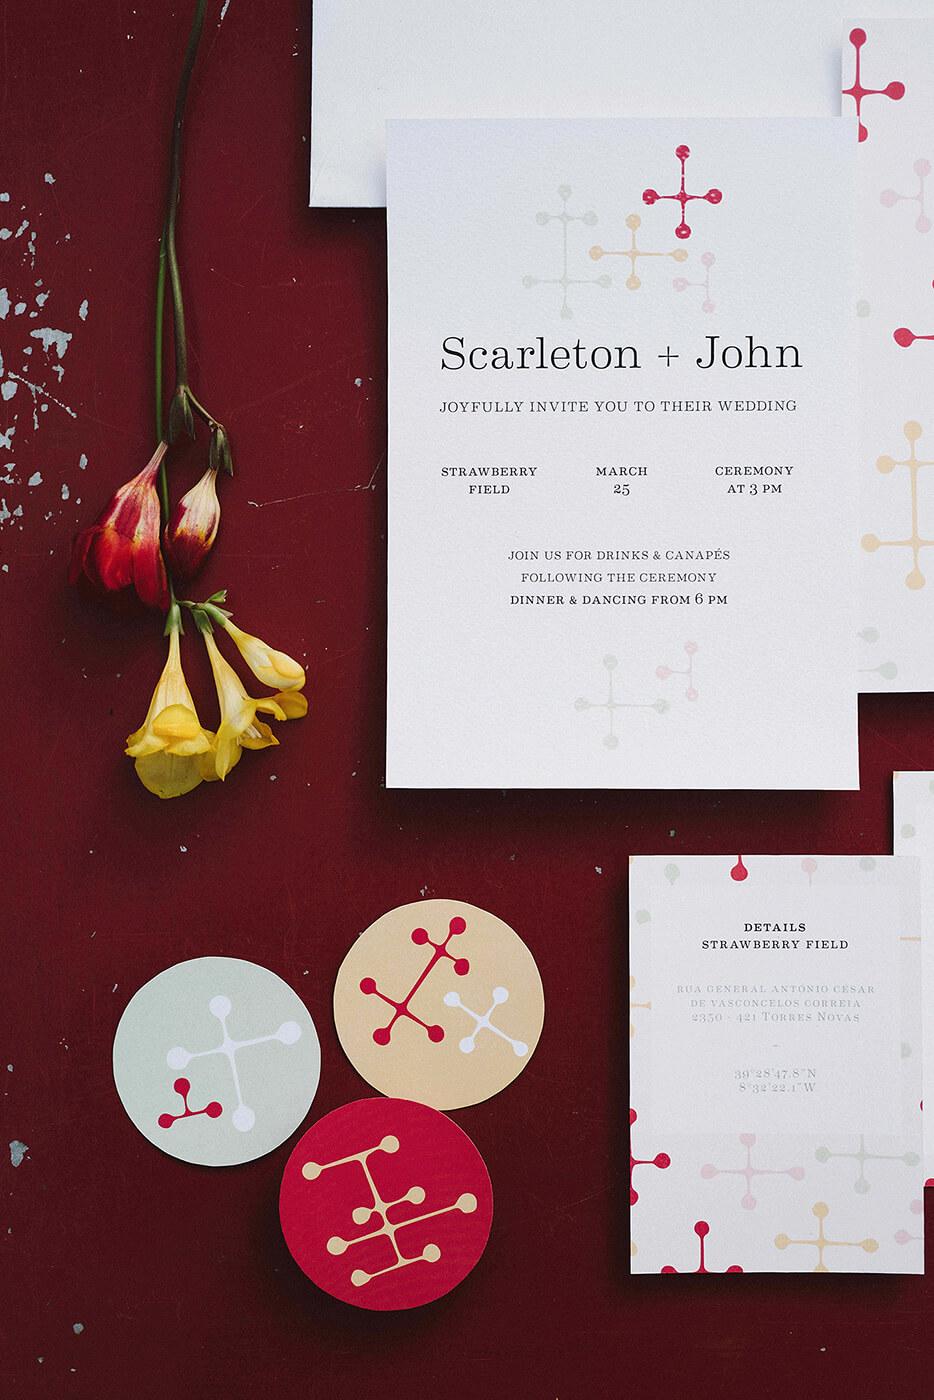 roma-organizacao-eventos-editorial-mid-century-modern-wedding-in-a-strawberry-field-37